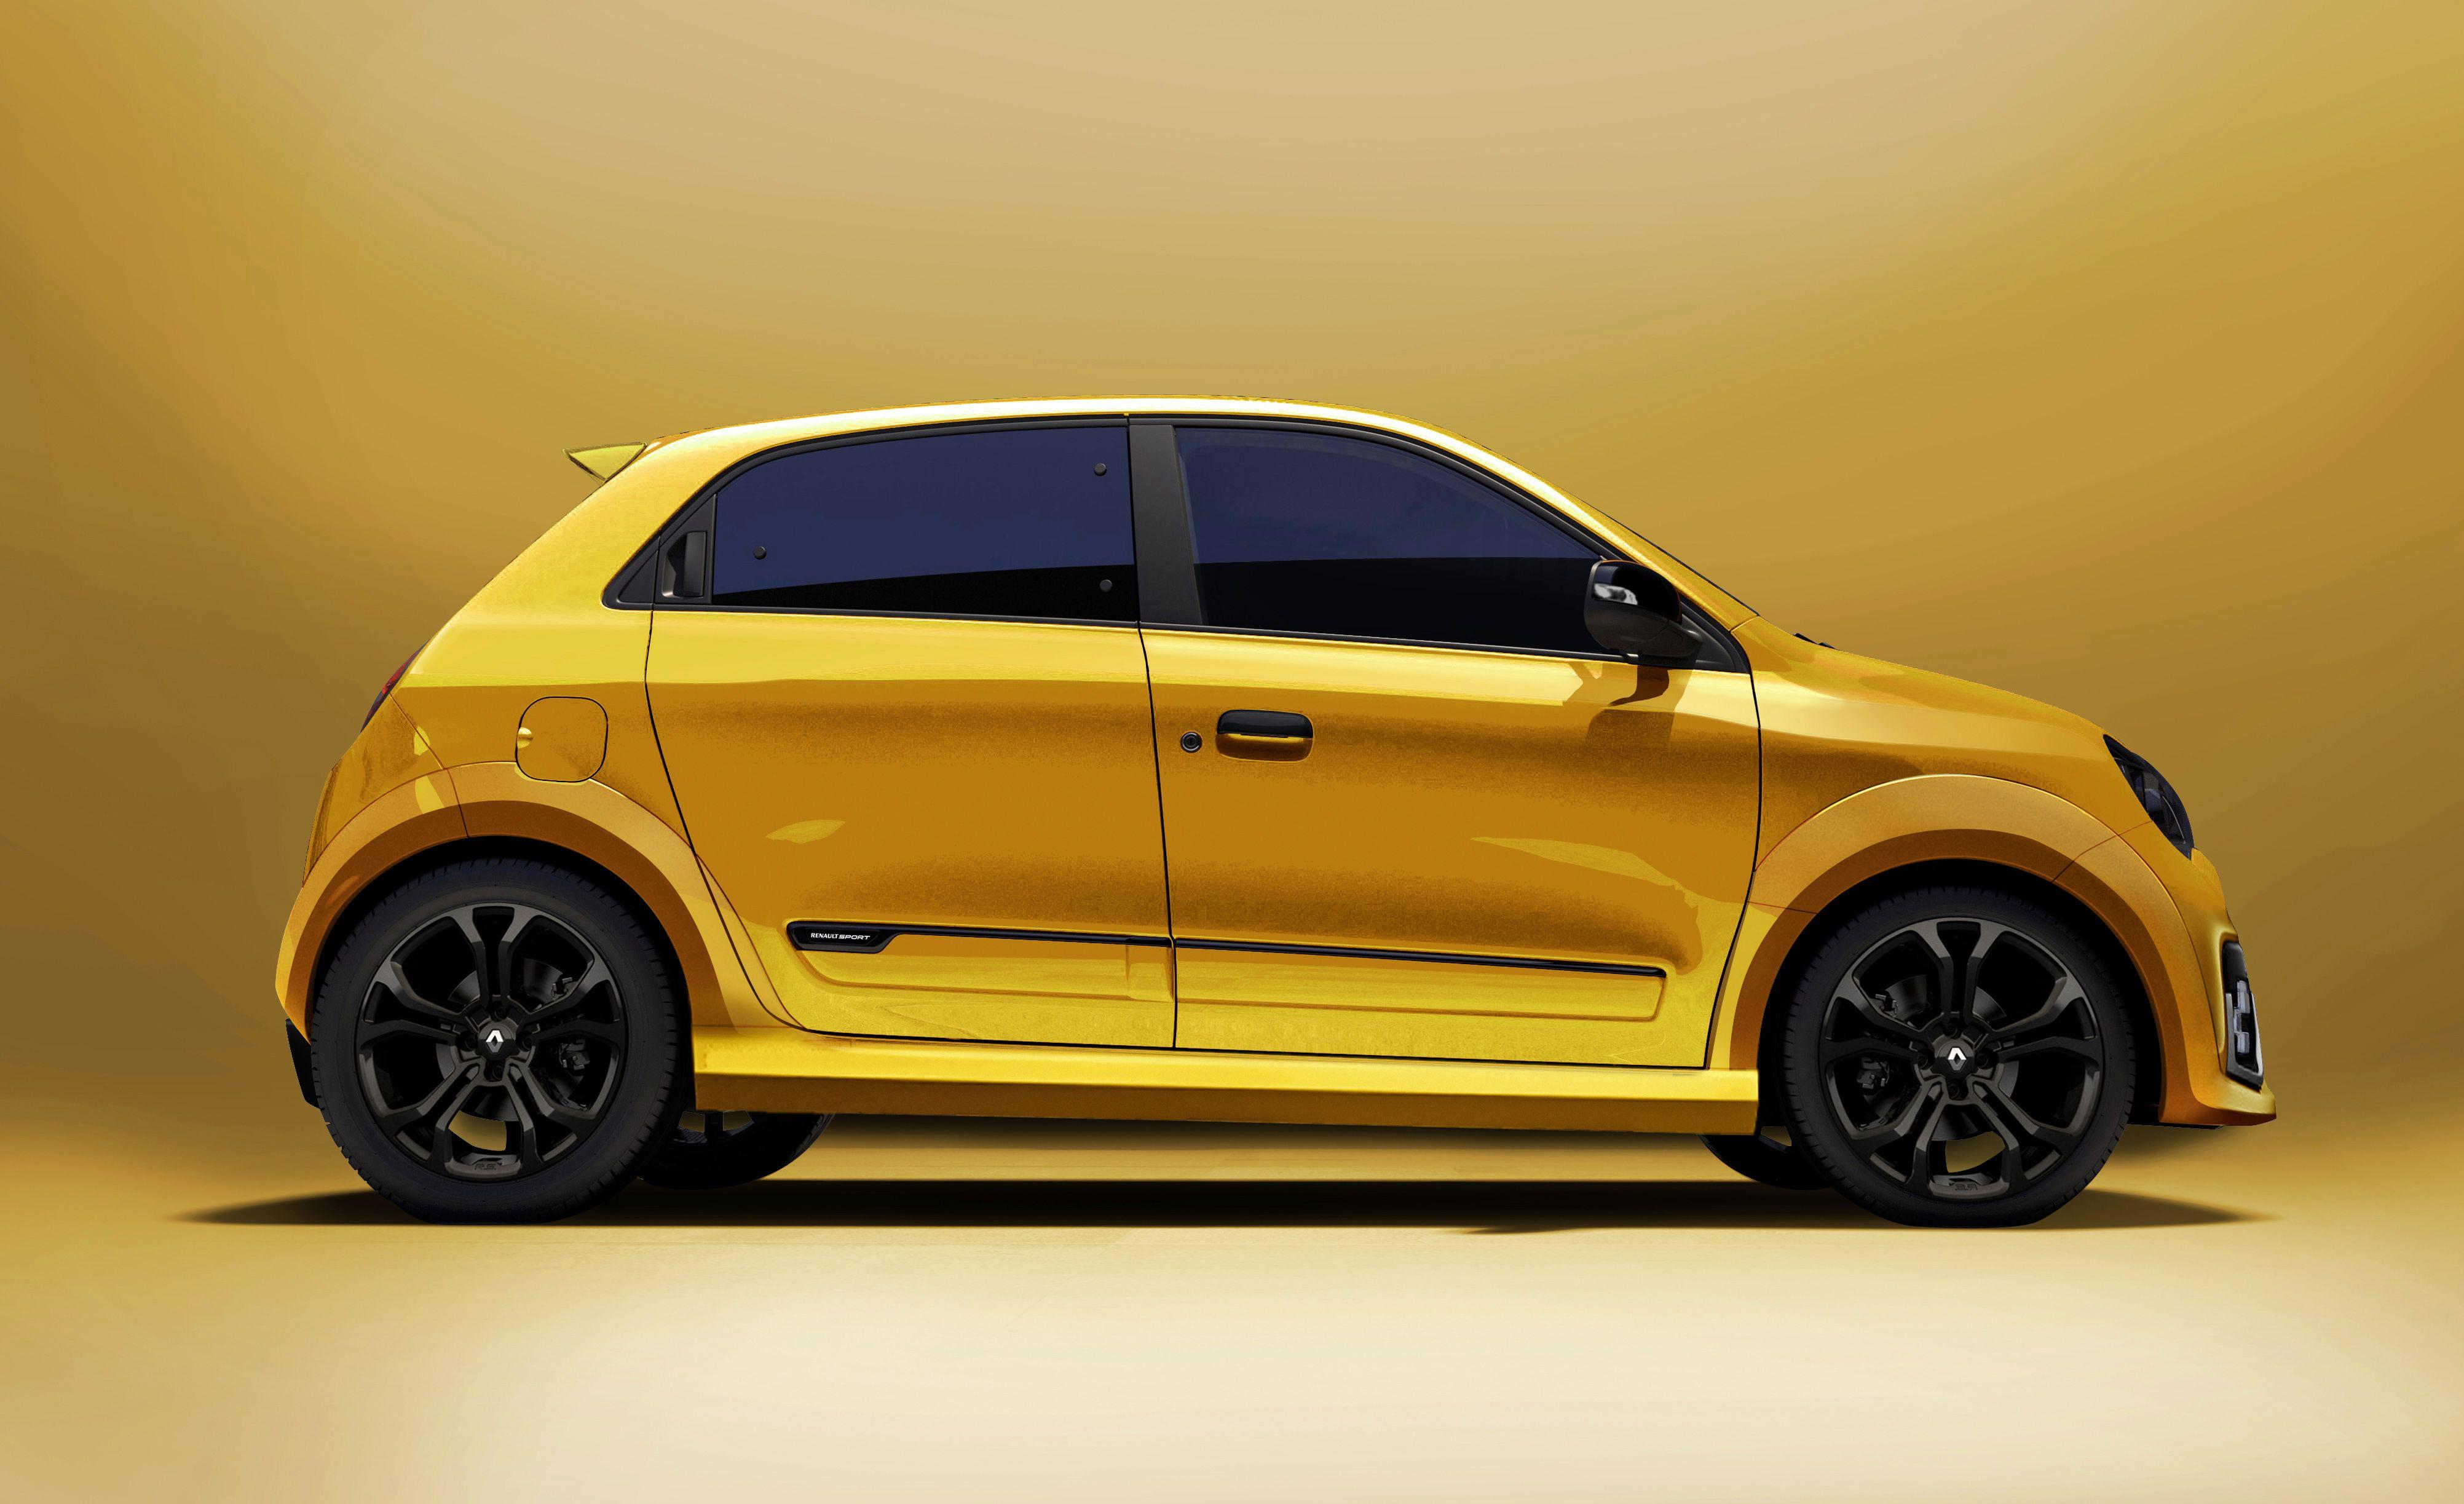 Renault Twingo R S 2017 Render C Monholo Oumar 2016 Renault 5